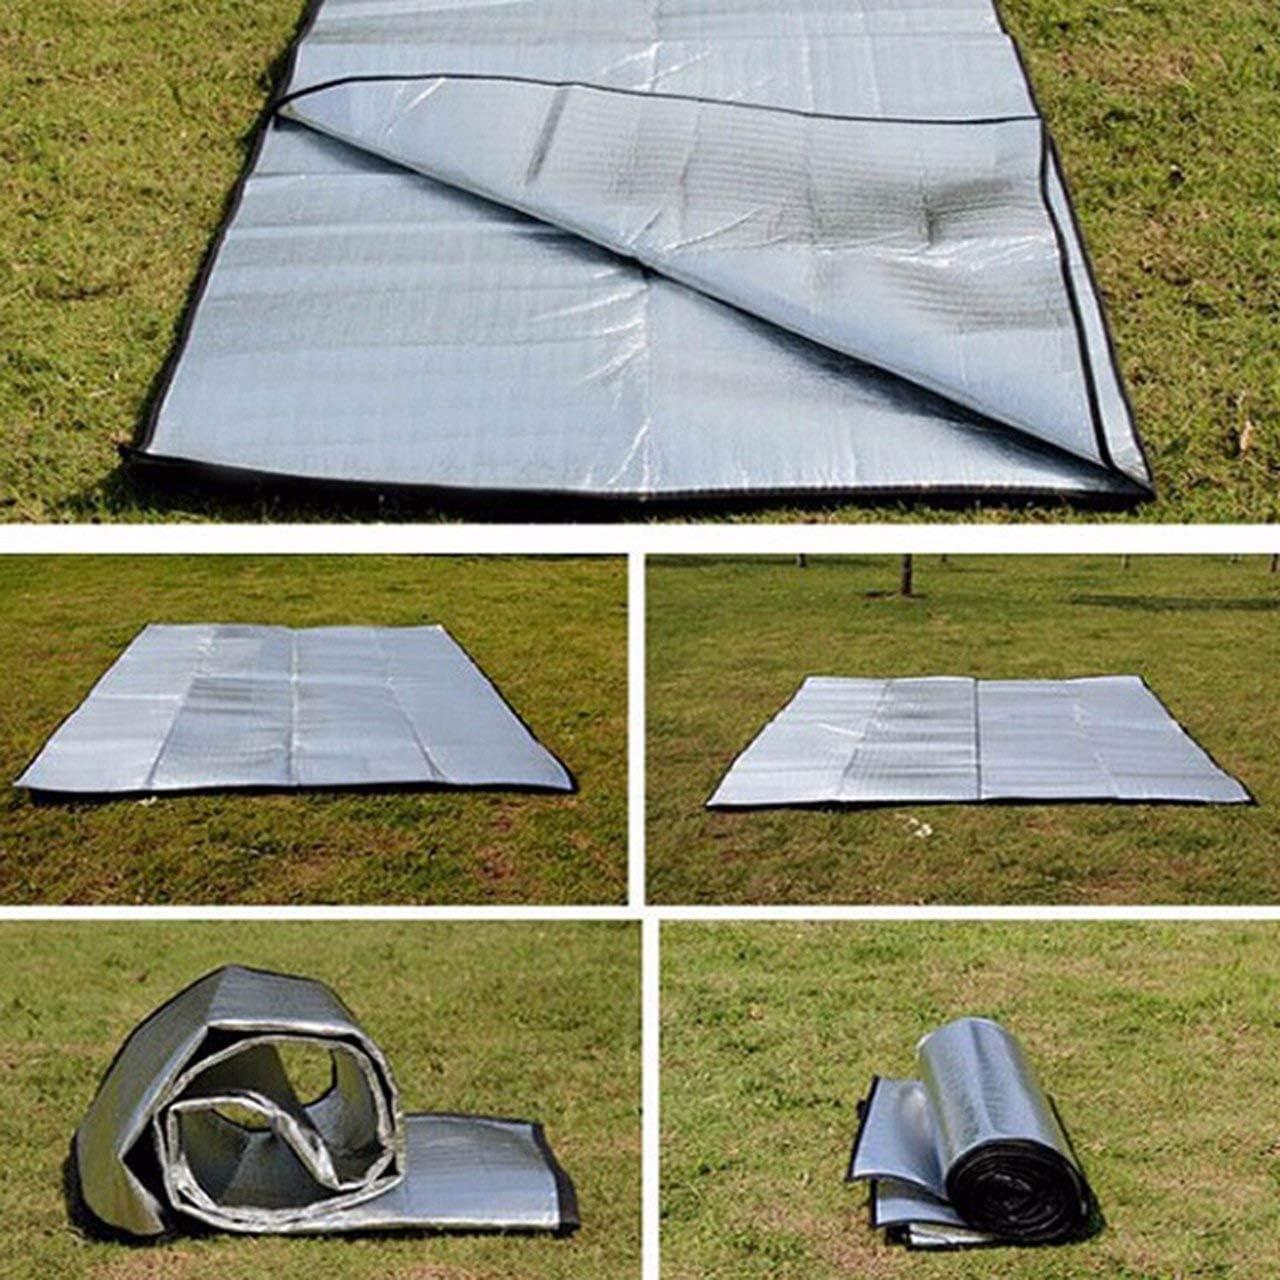 silver Double Sided Foldable Waterproof Aluminum Foil Mat Outdoor Travel Beach Mat Sleeping Mattress for Camping Hiking Jasnyfall